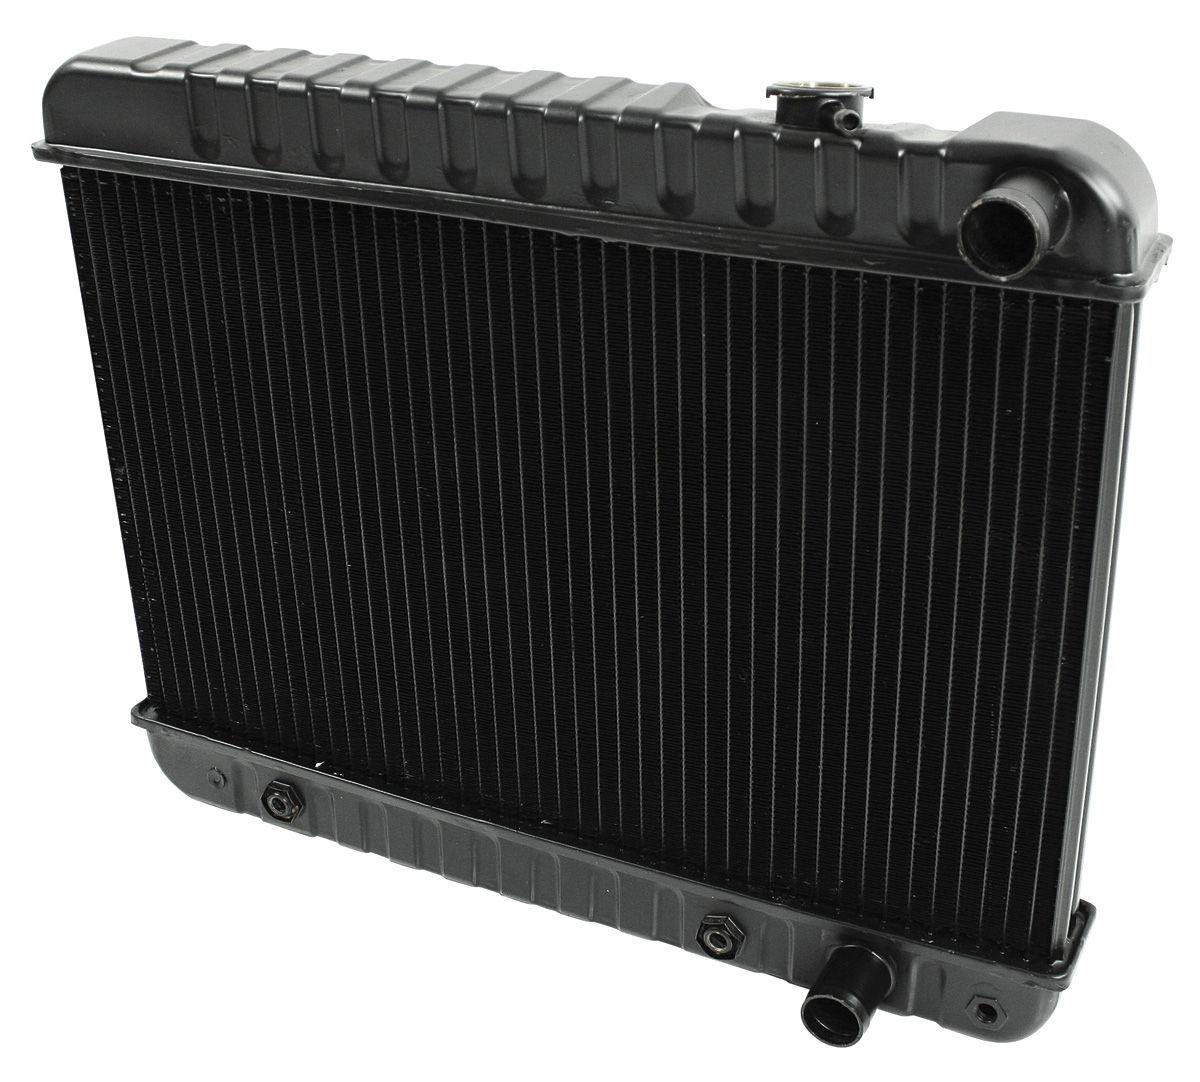 "Radiator, 1961-63 Skylark, 6-Cyl., Manual, 3-Row, 12-3/8"" X 25-1/4"" X 1-1/4"""